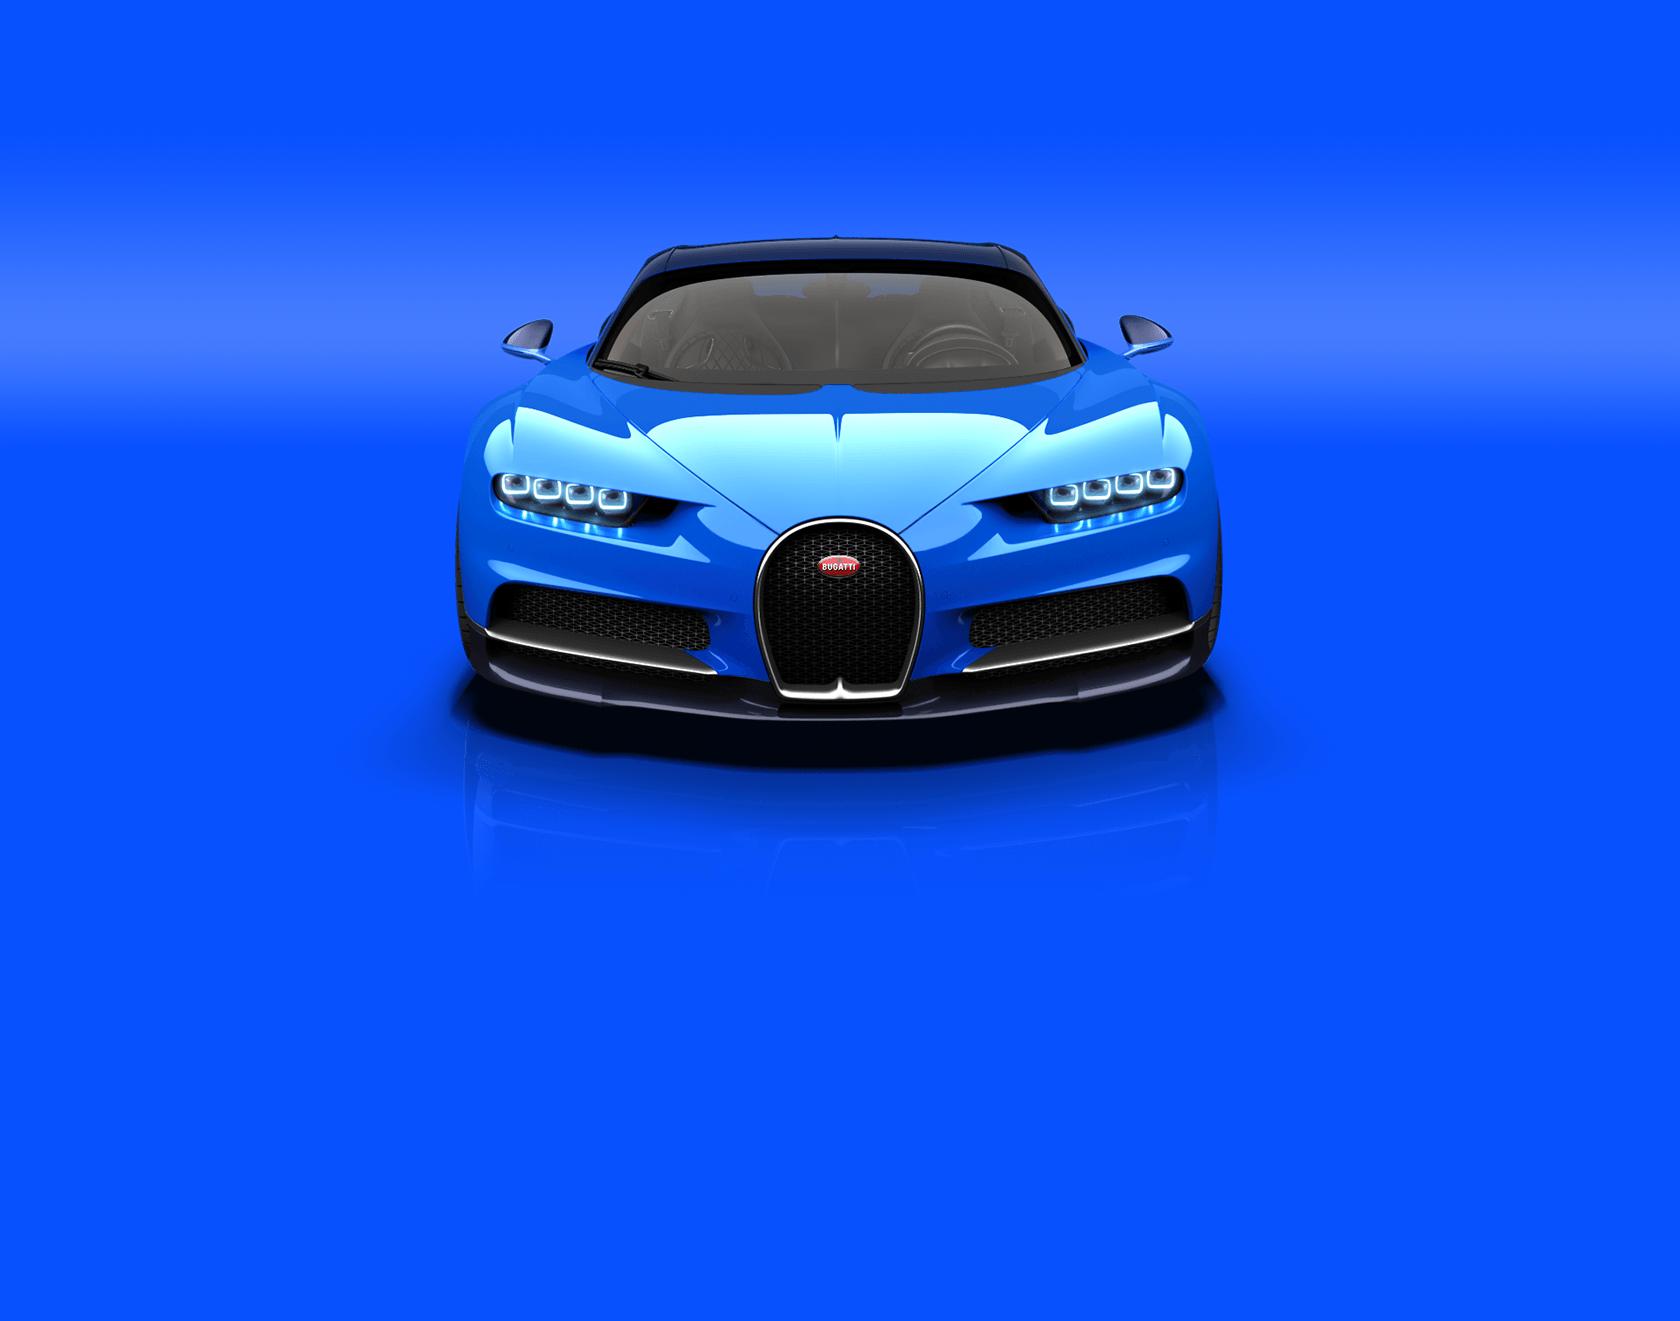 b4818cf42ae47accbff72883ff6bbb10 Stunning Bugatti Veyron Price In Brazil Cars Trend